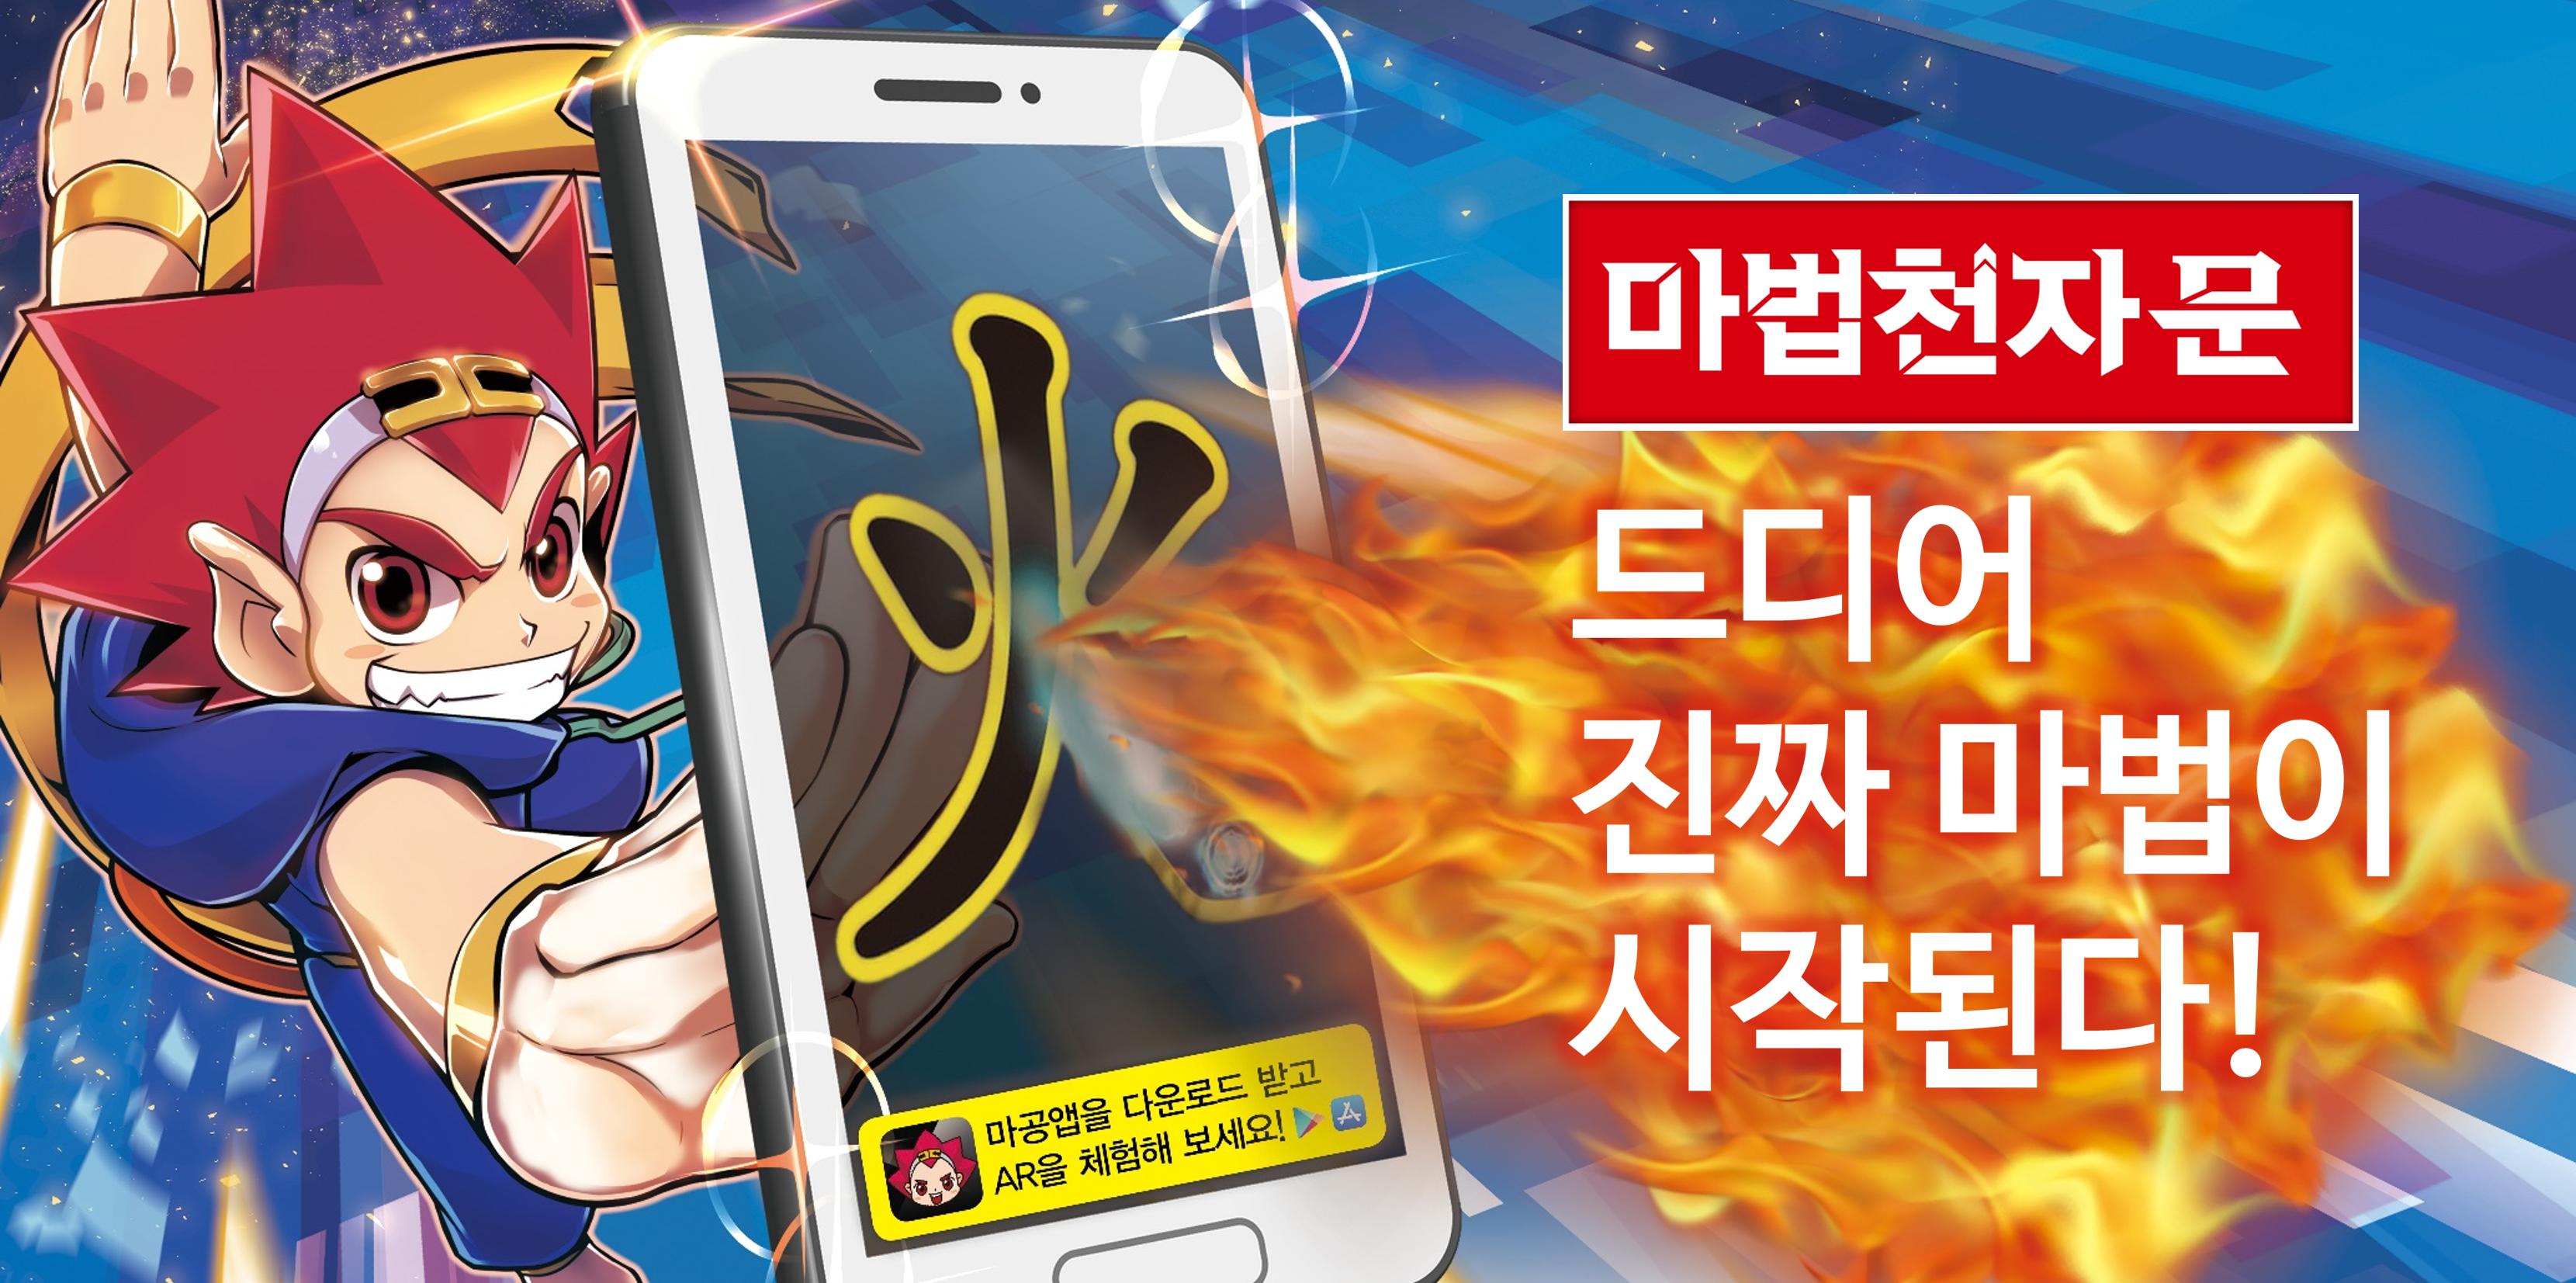 [MWU Korea 2019] 마공앱/ Dnsoft